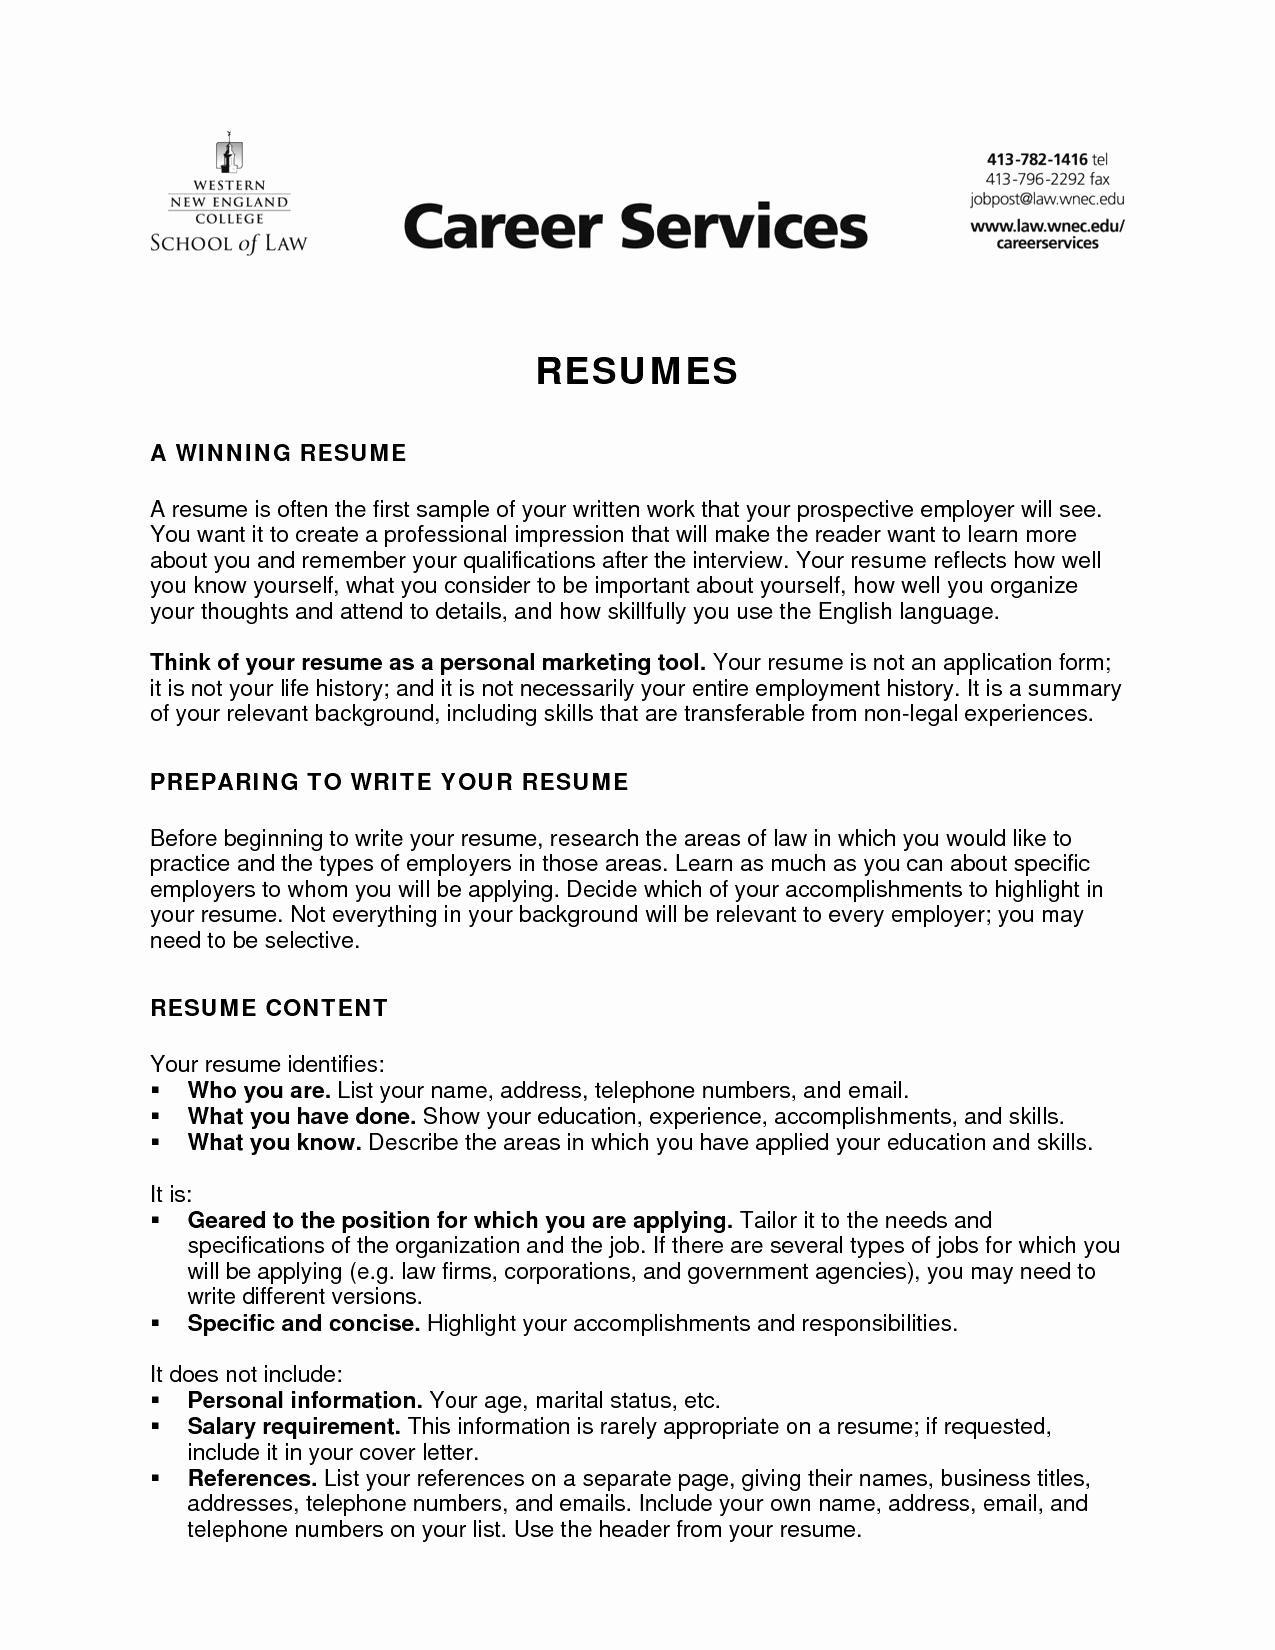 Visa Letter Template - Resume Templates Poppycockreviews